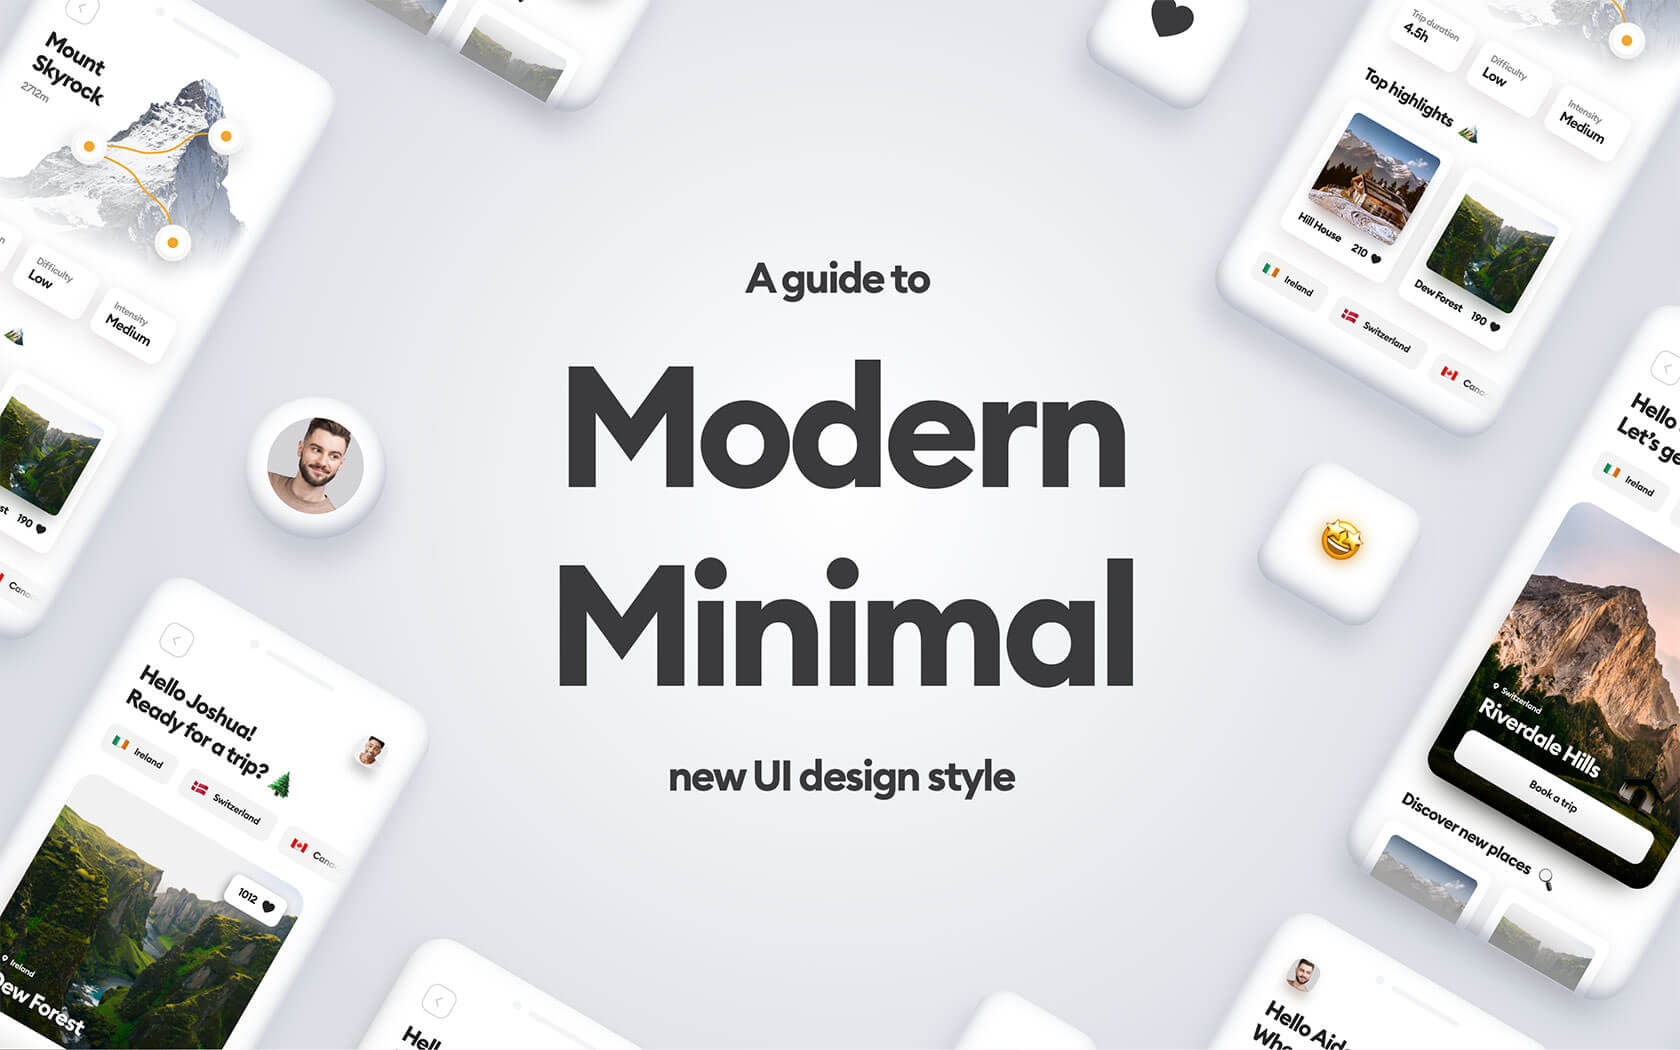 minimal-webdesign-guide-cover